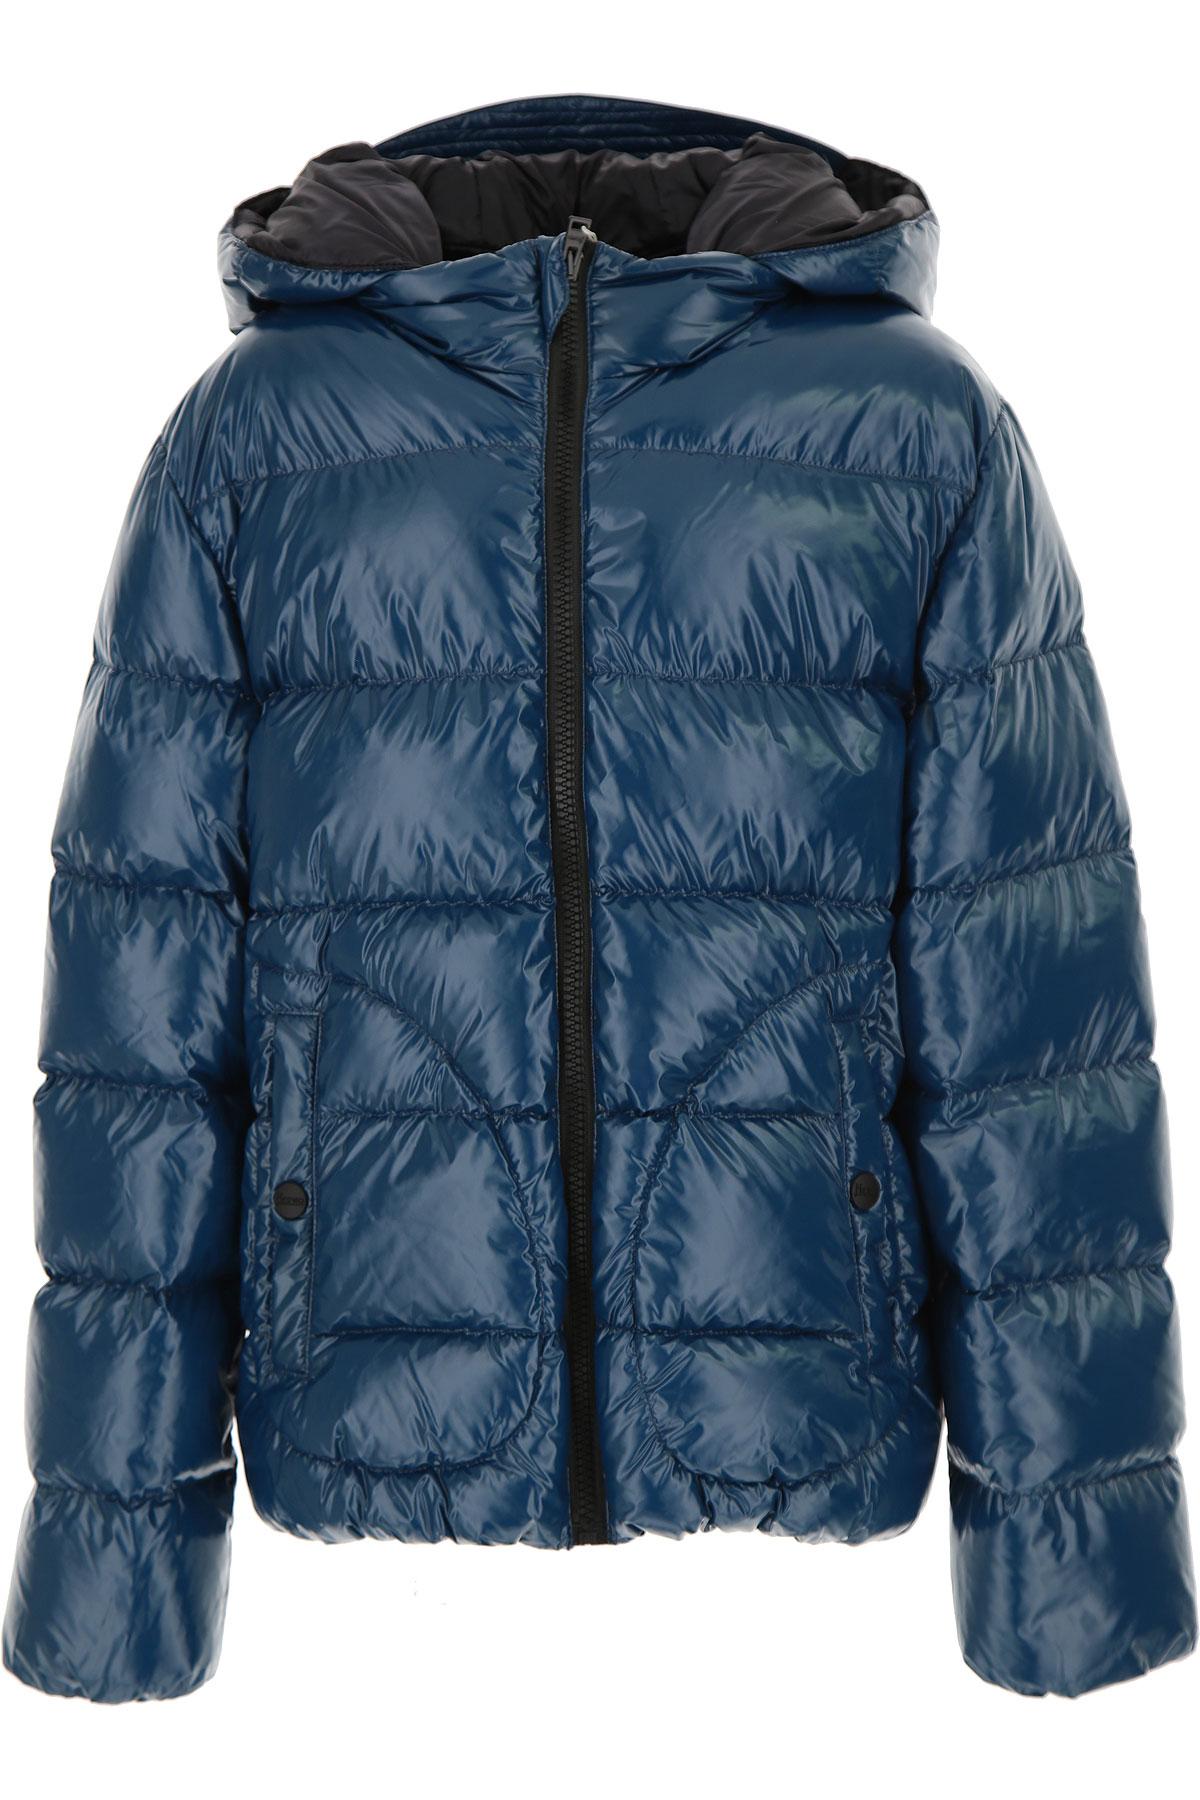 Herno Boys Down Jacket for Kids, Puffer Ski Jacket On Sale, Avio Blue, polyamide, 2019, 10Y 12Y